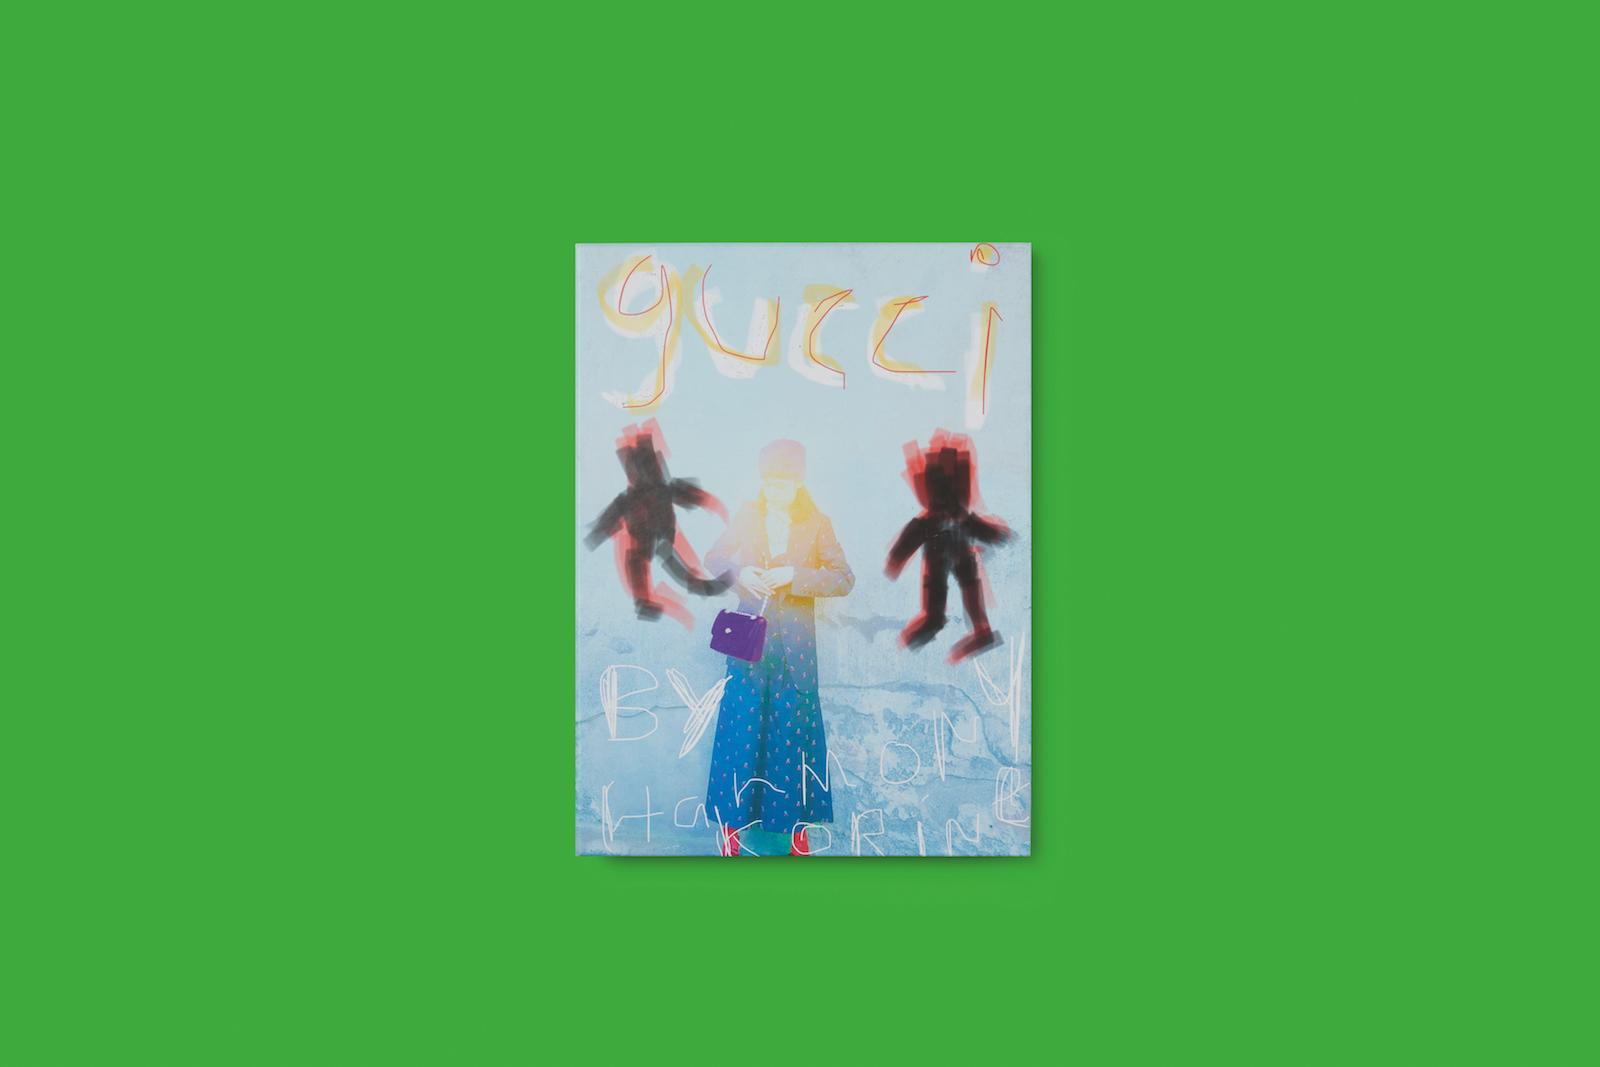 Gucci harmonykorine metalmagazine4